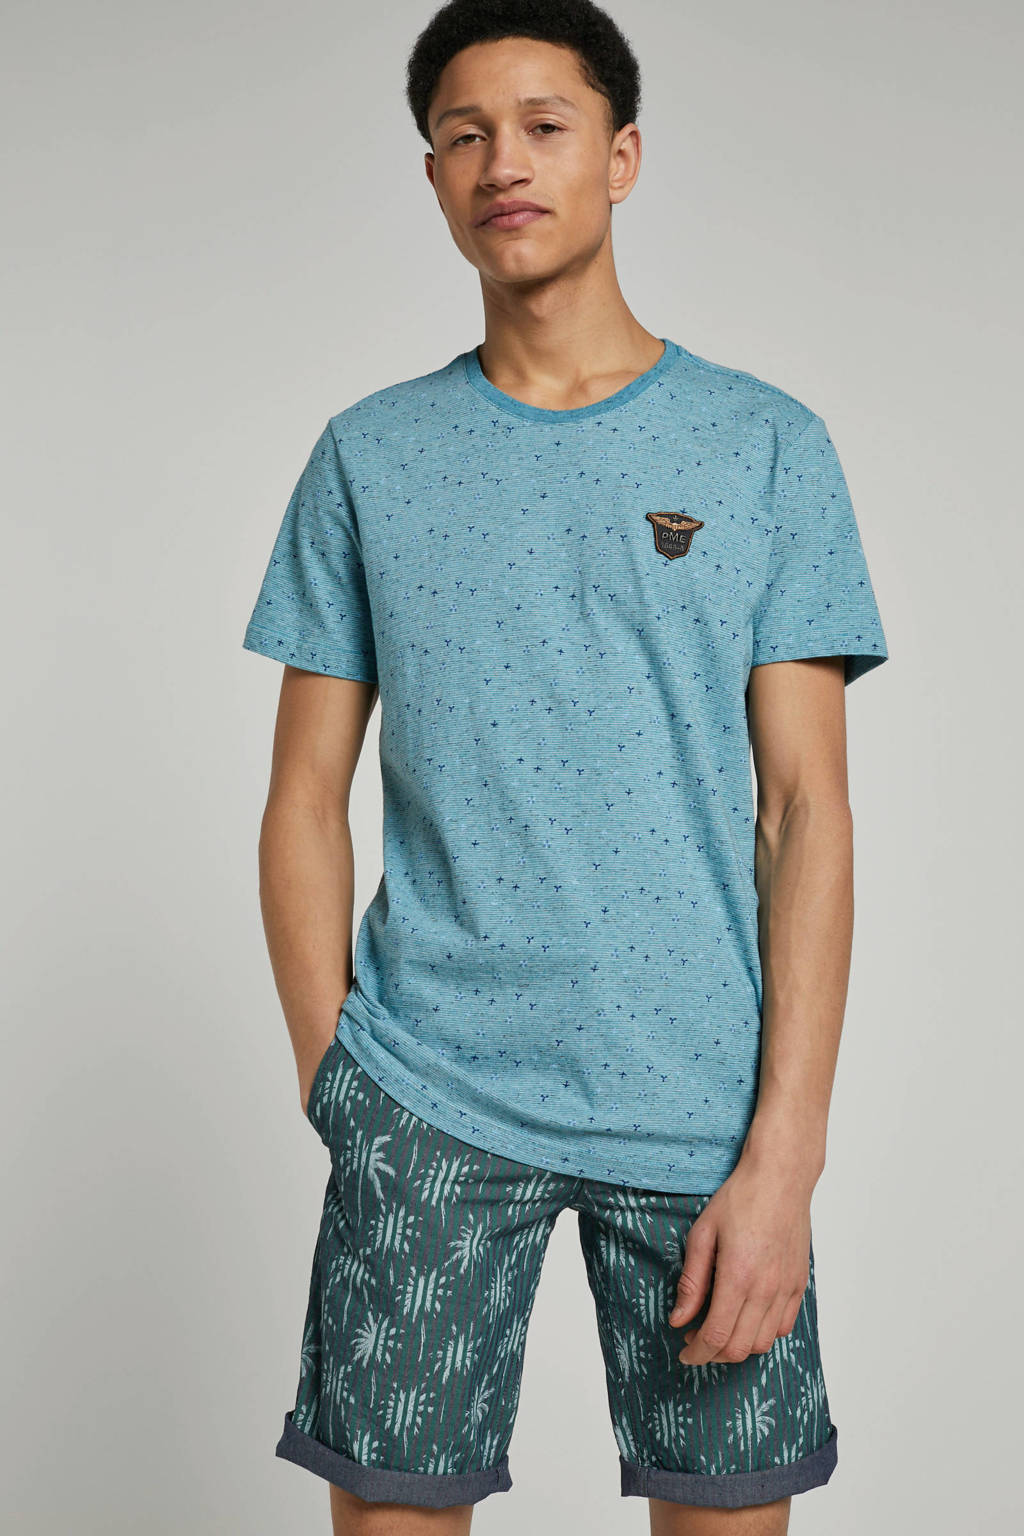 PME Legend T-shirt met printopdruk, Blauw/groen